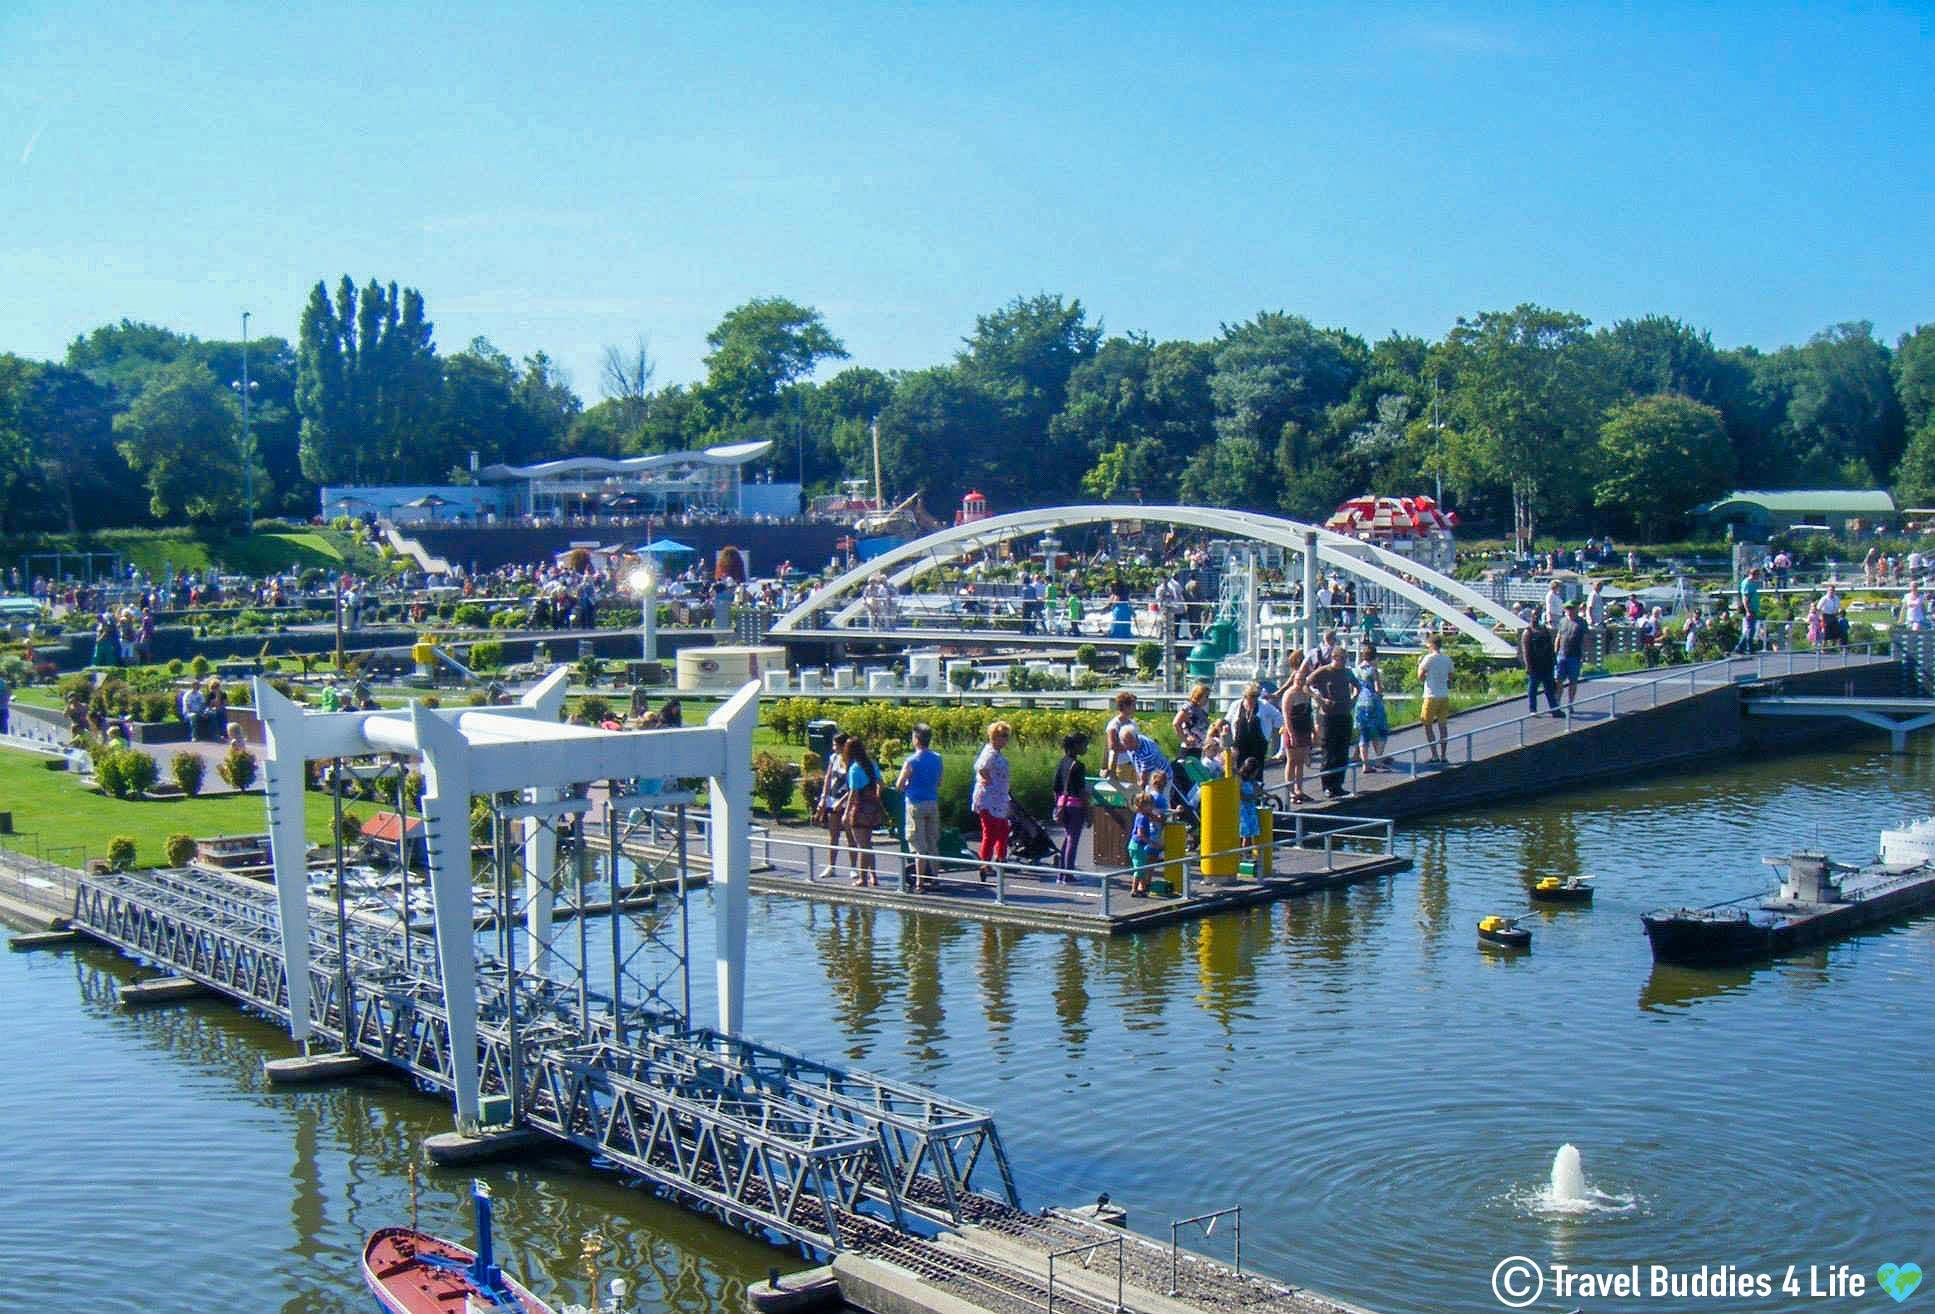 The Miniature City Of Madurodam, The Netherlands, Europe